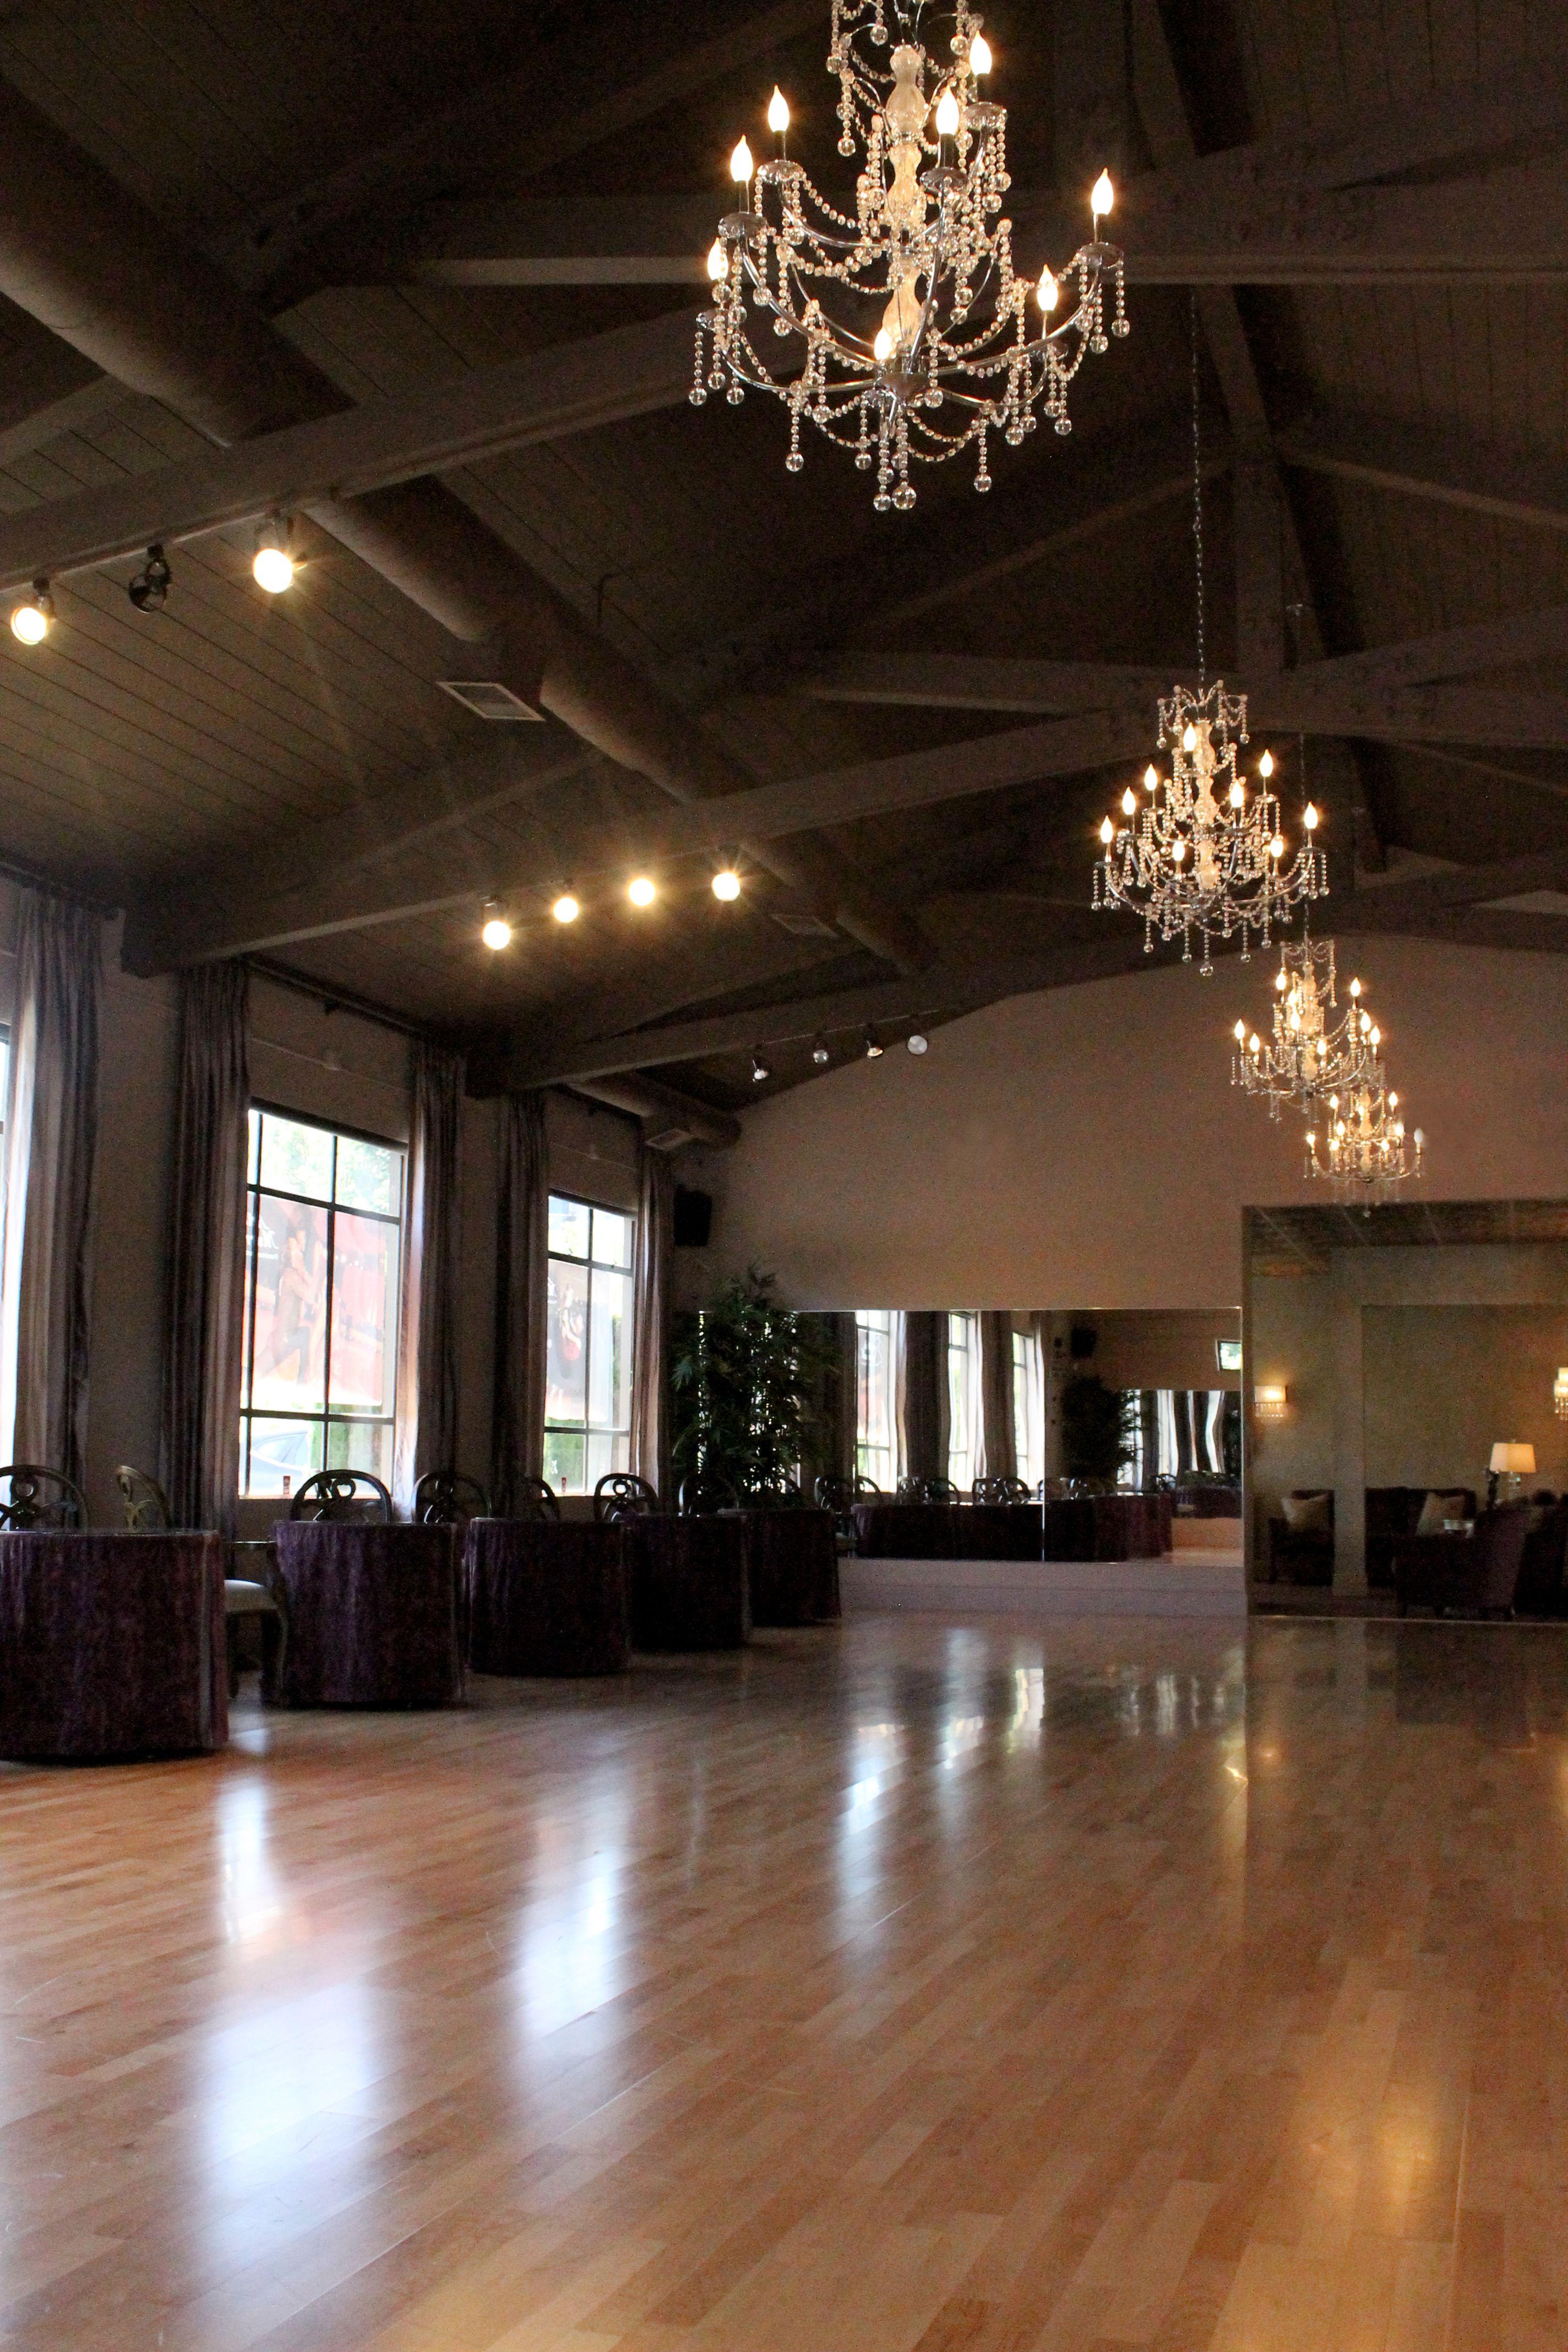 Arthur Murry Dance Studio Designed By Joann Boccolini And Stephanie